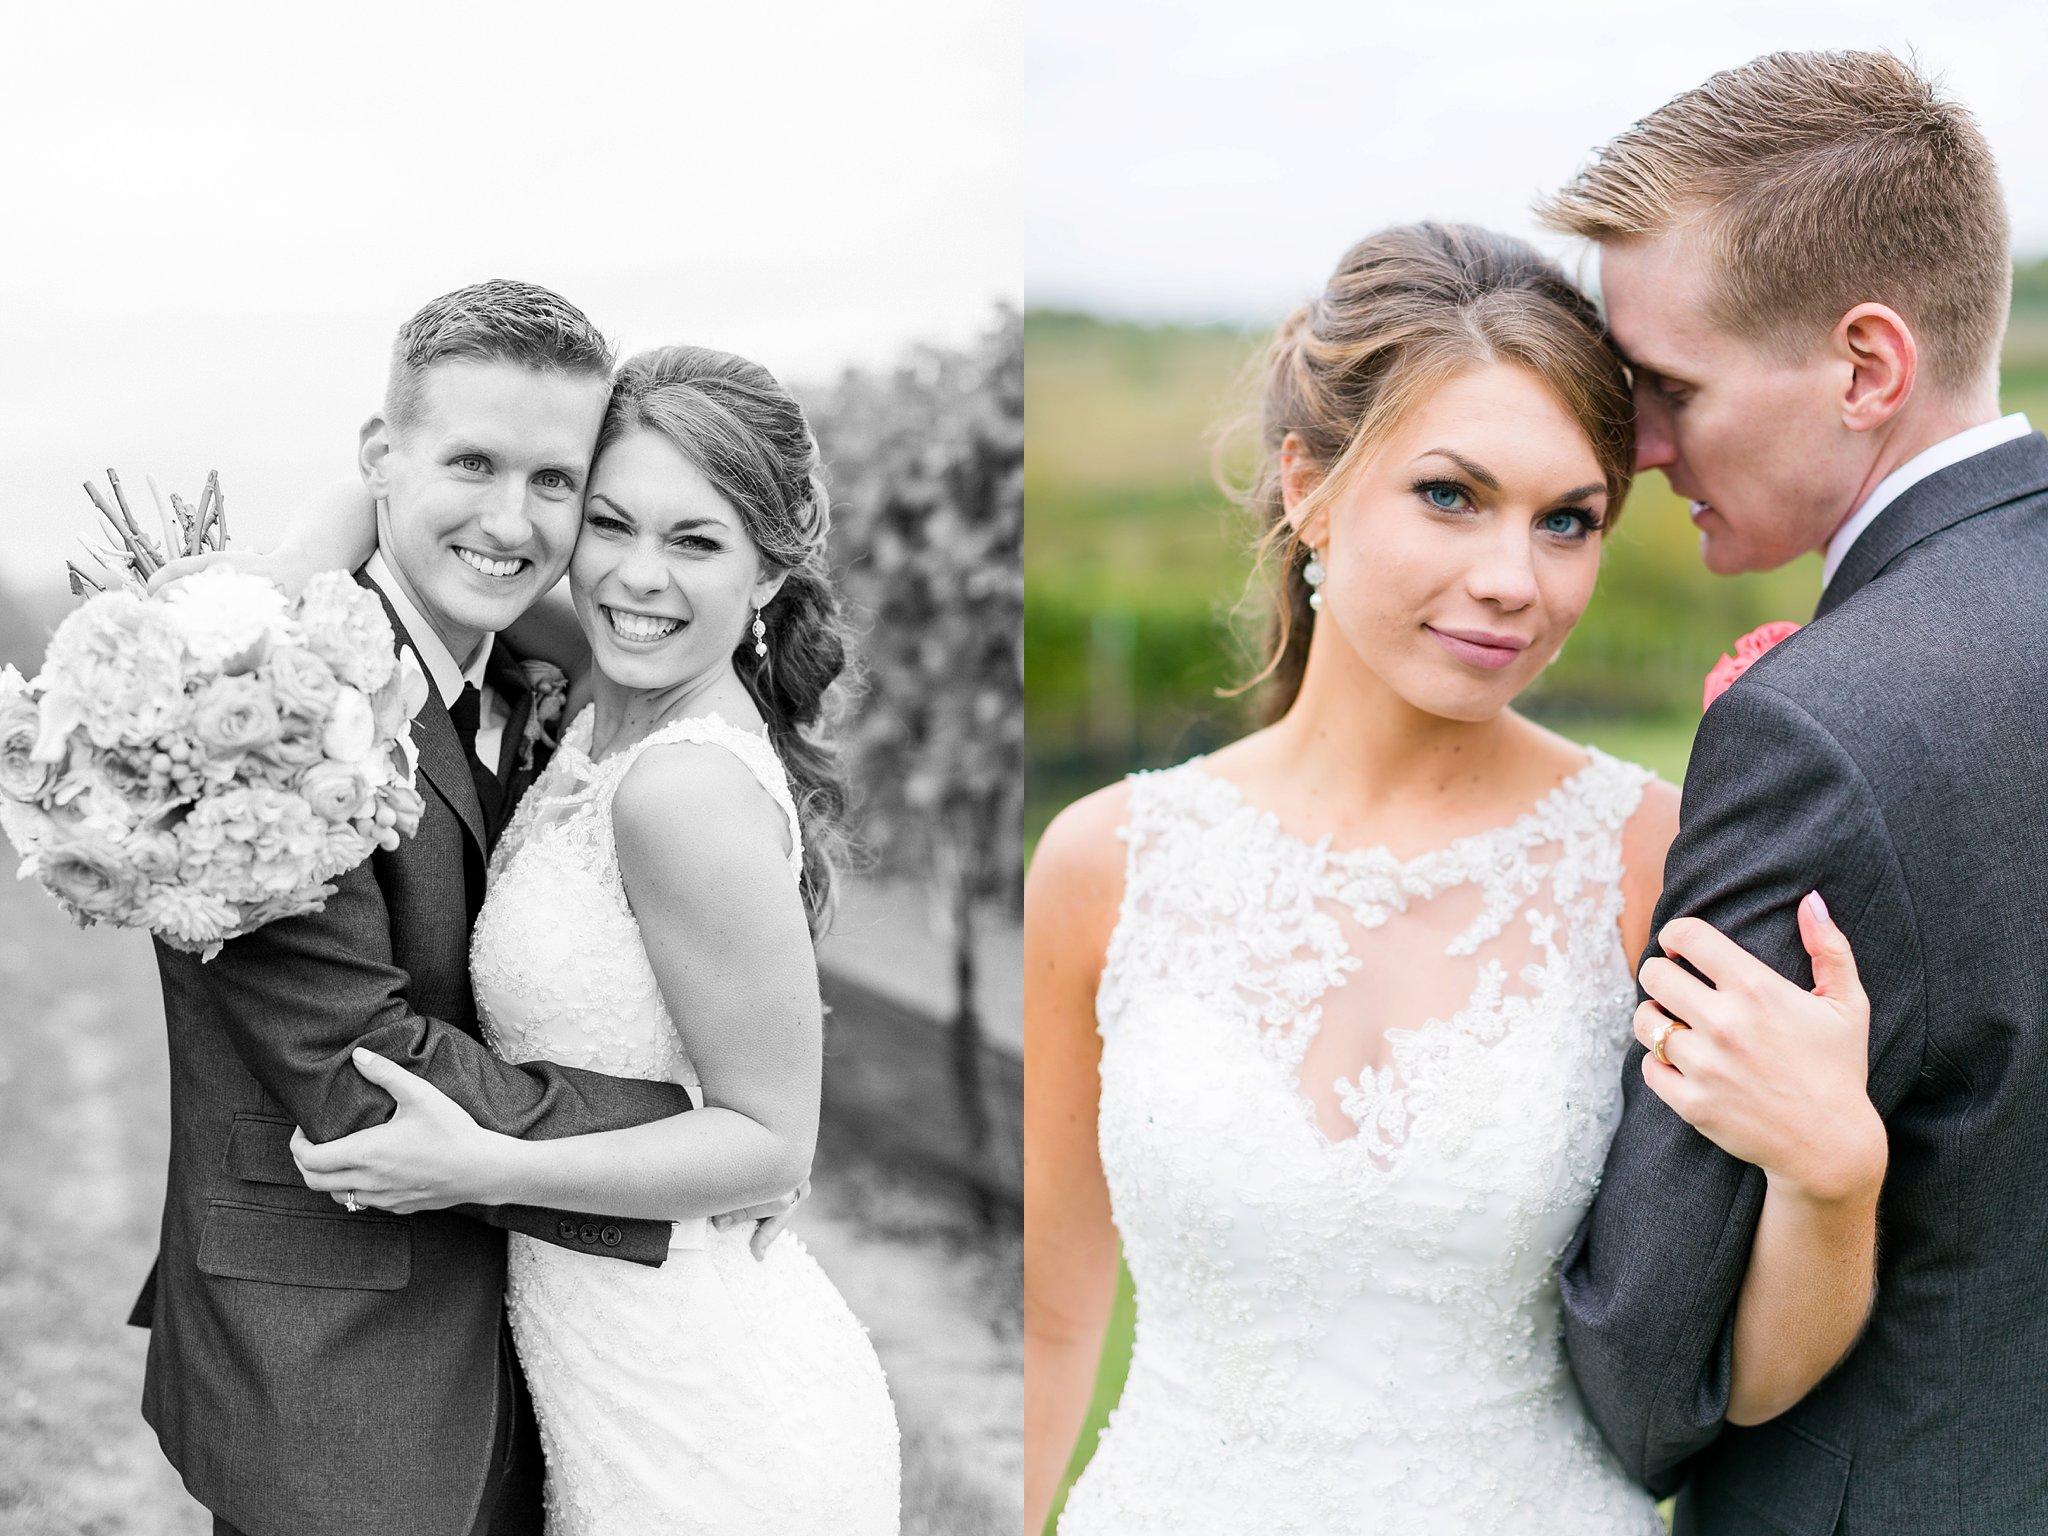 Stone Tower Winery Wedding Photos Virginia Wedding Photographer Megan Kelsey Photography Sam & Angela-219.jpg